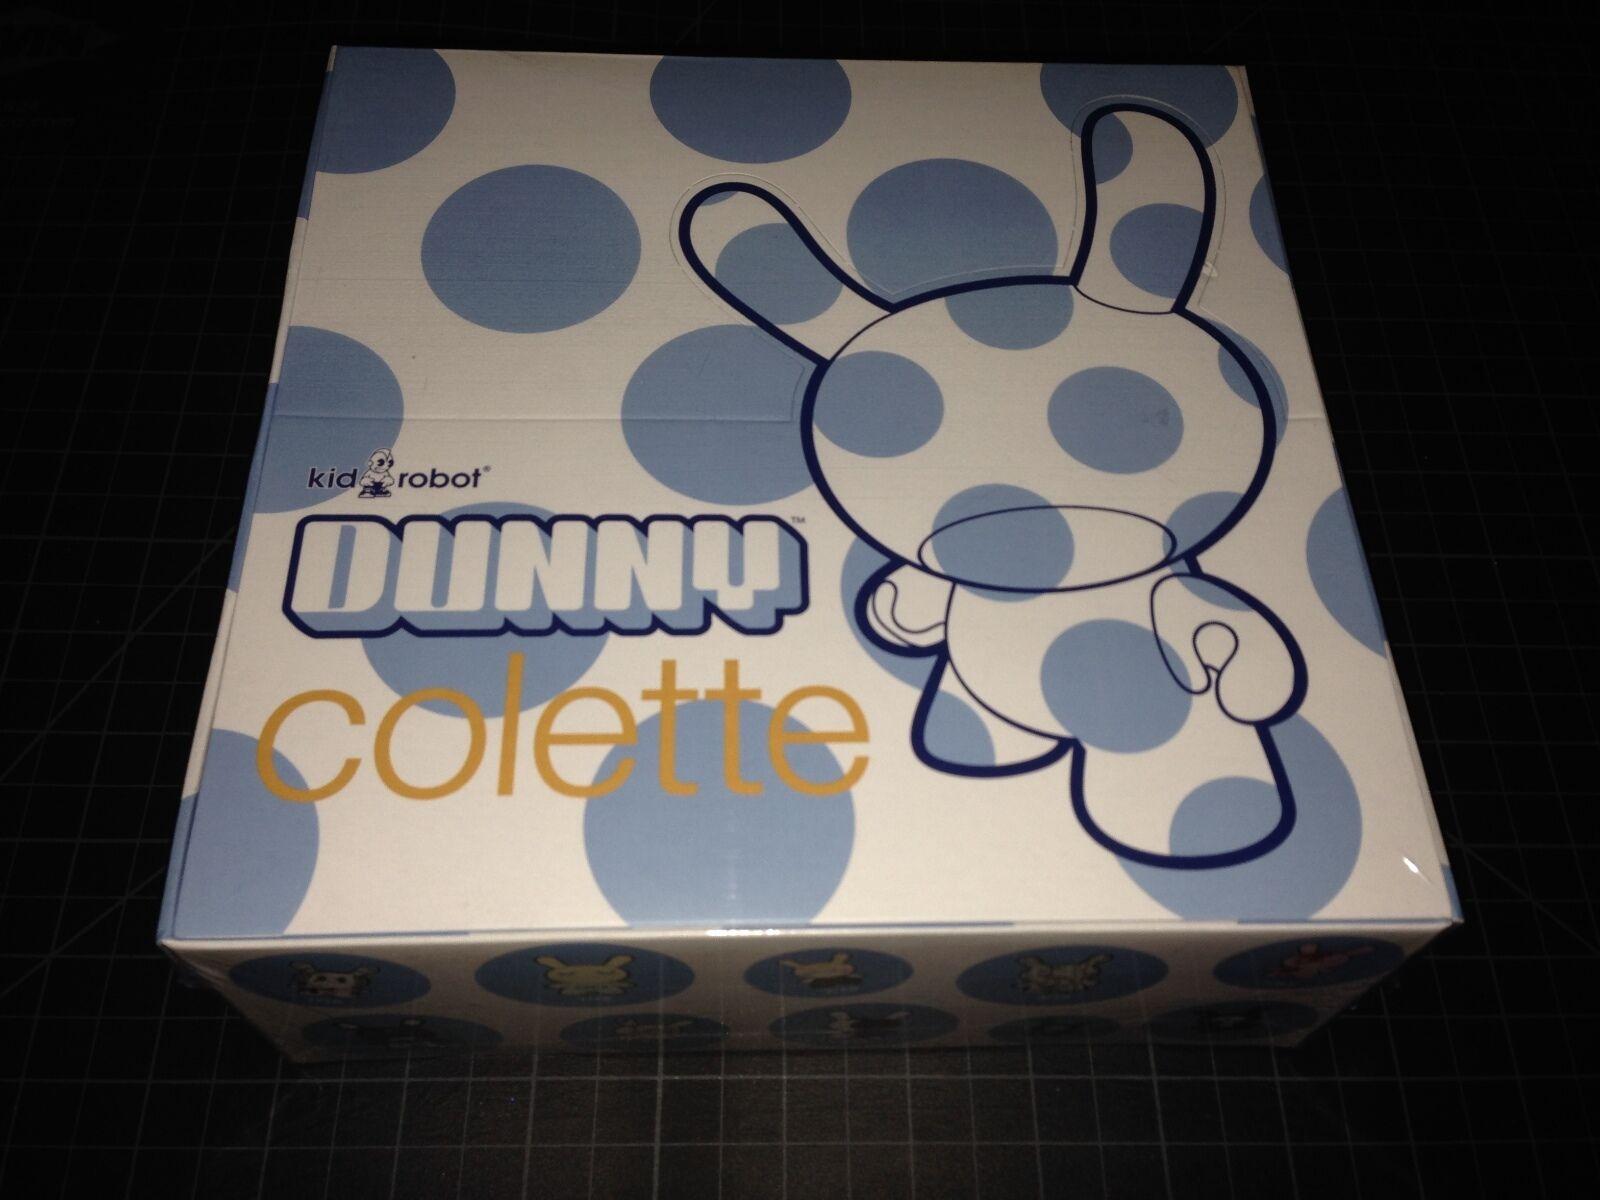 Kidrobot x DUNNY COLETTE FACTORY SEALED Case Blind Boxes Vinyl Figure Toy